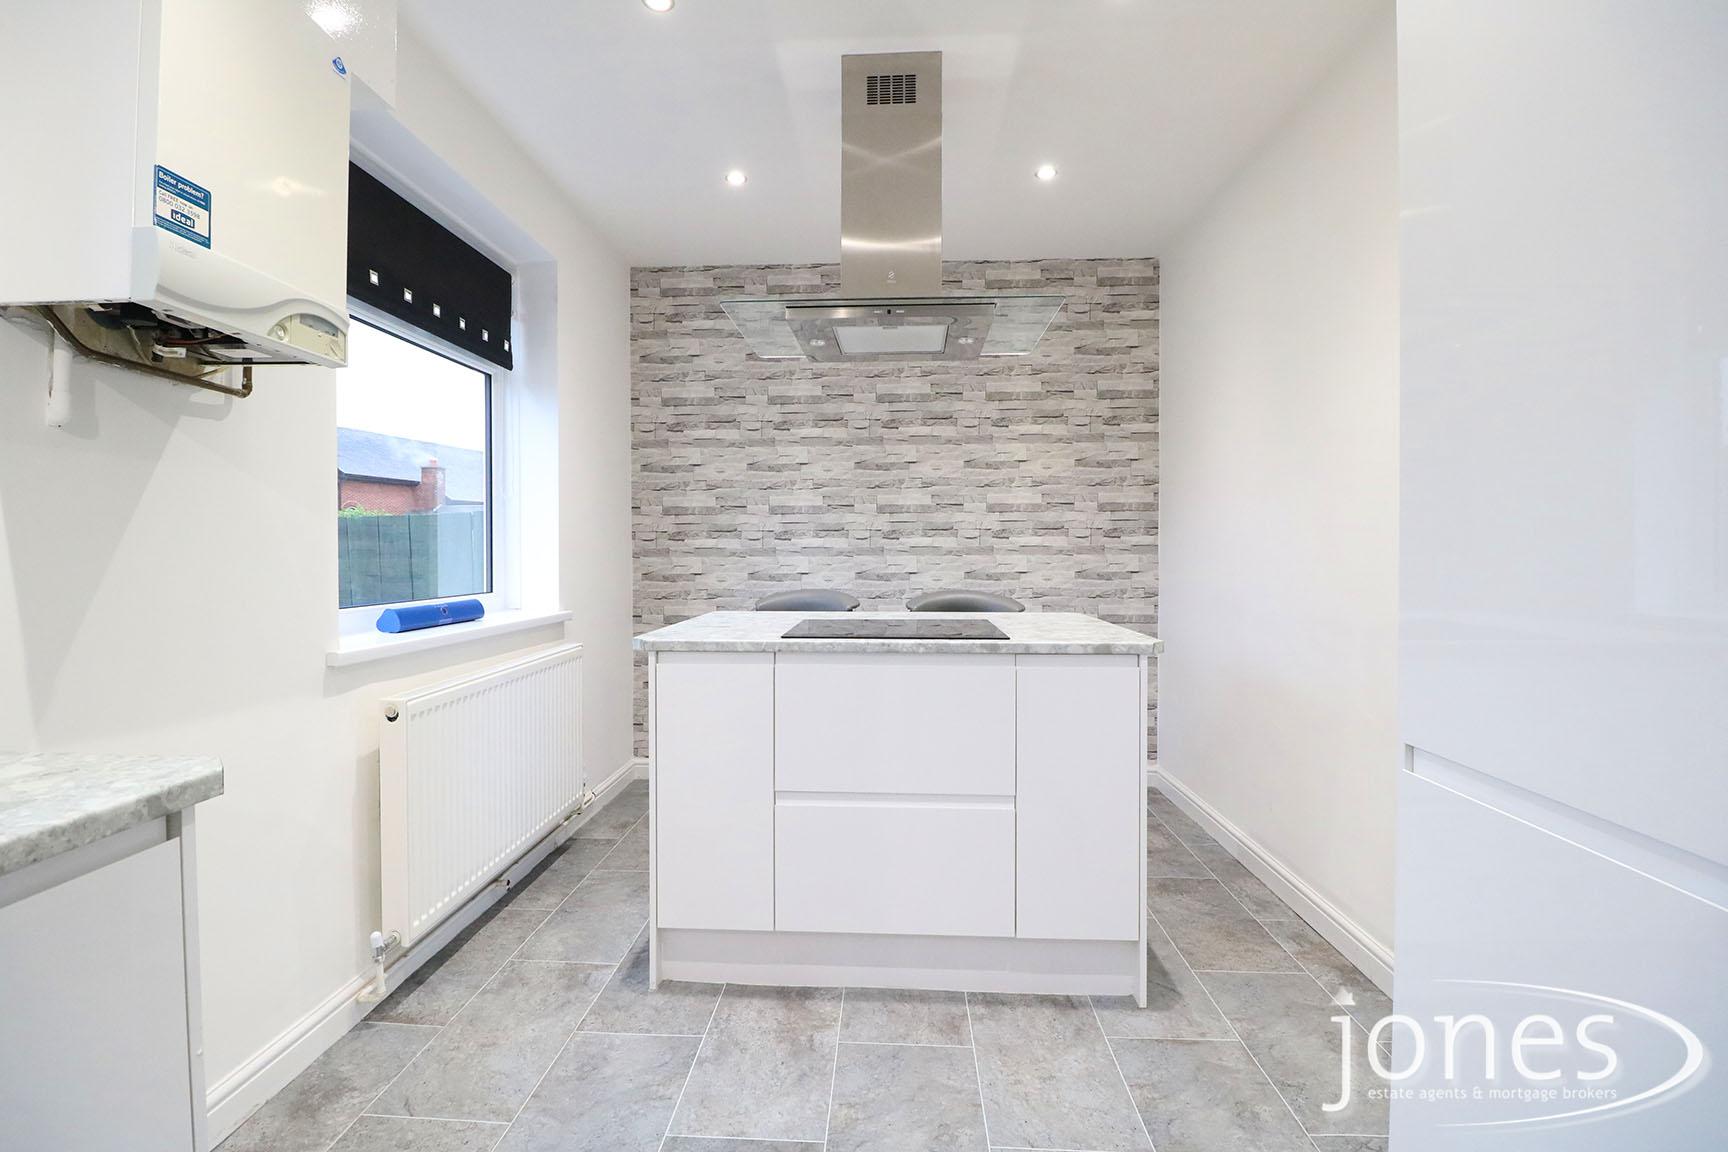 Home for Sale Let - Photo 03 Feetham Avenue, Darlington, DL1 2DY